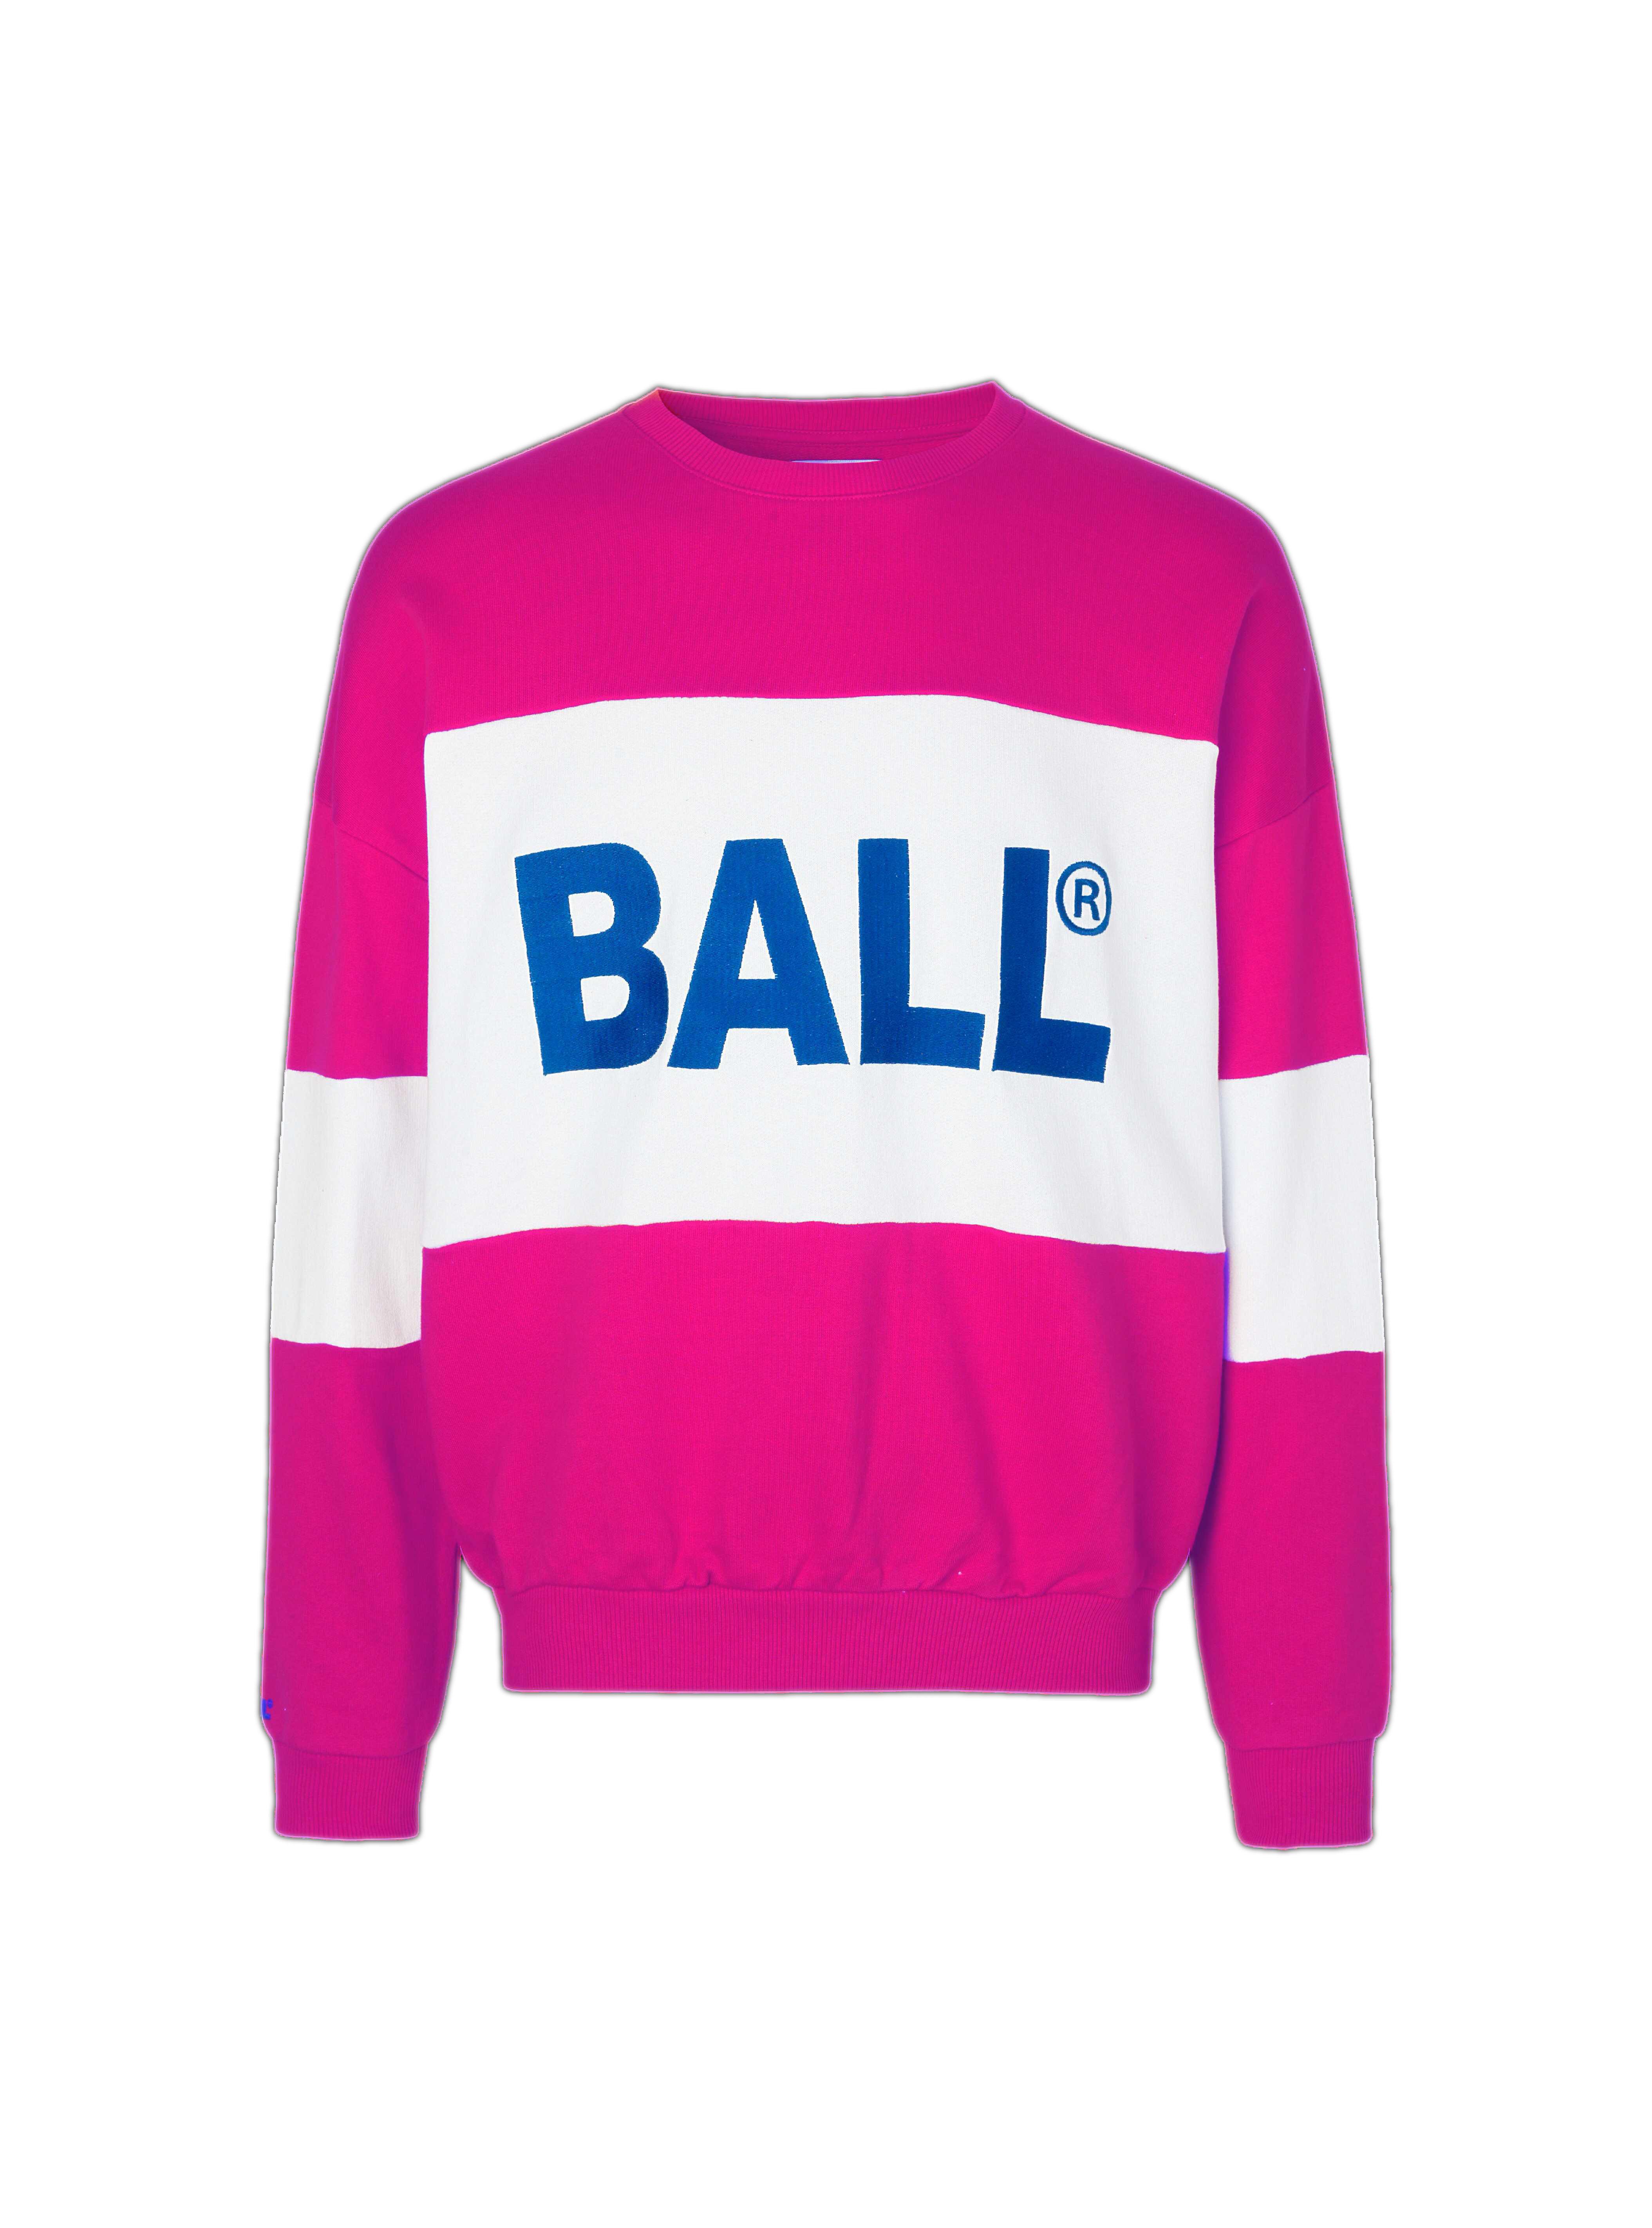 BALL Original Summer Crew Neck sweatshirt